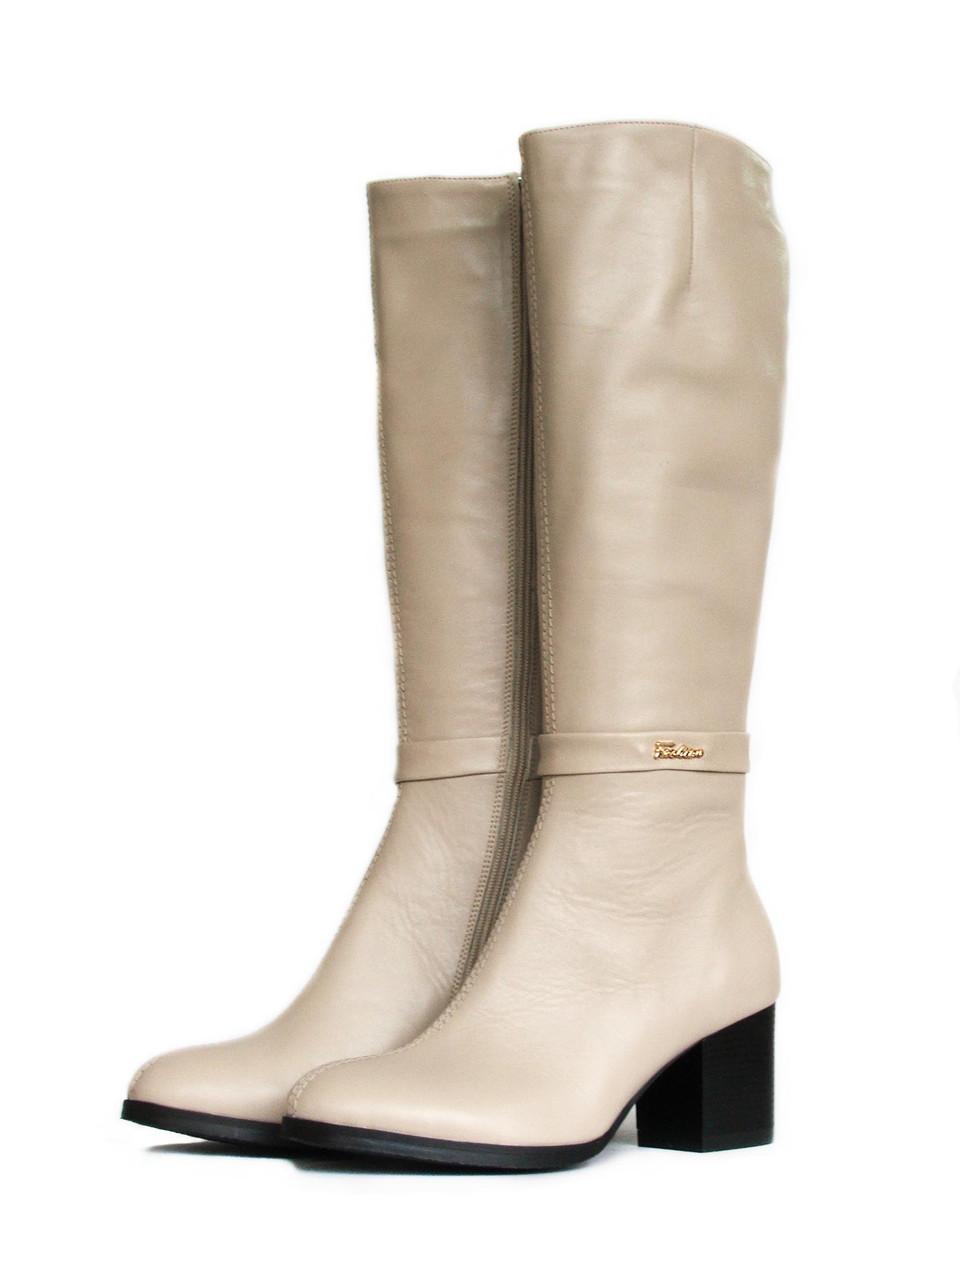 Кожаные бежевые сапоги на широком каблуке